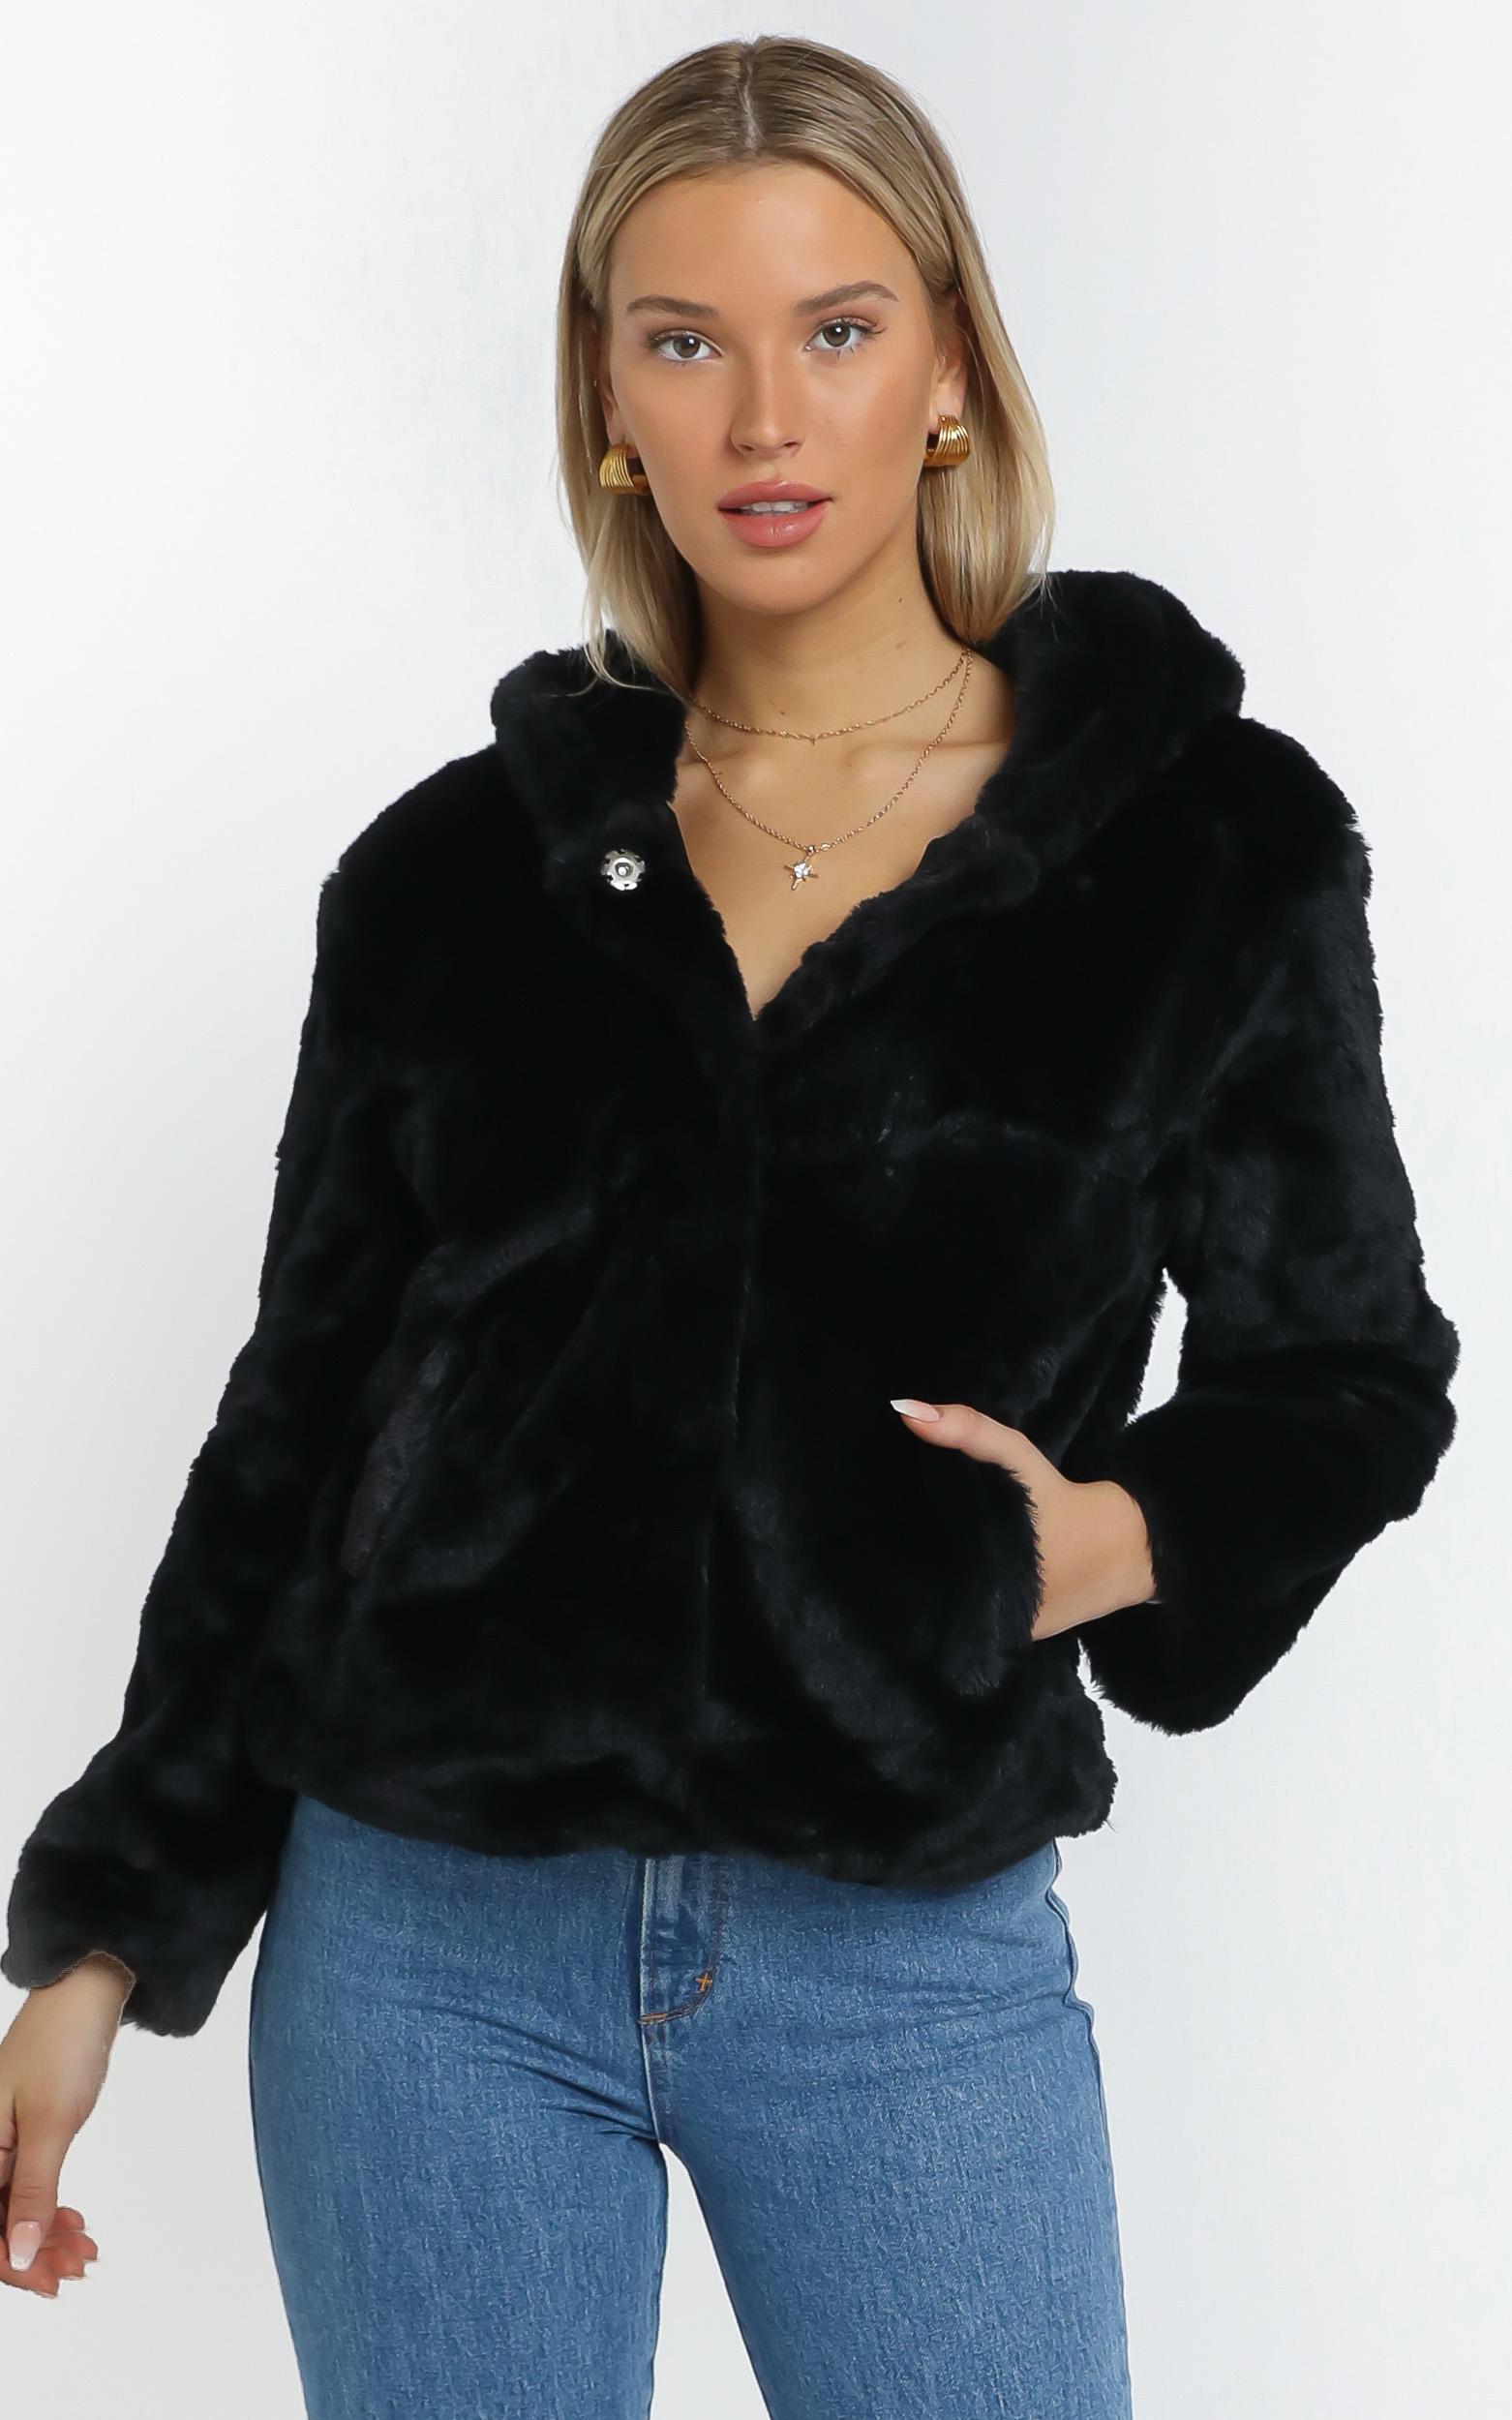 Tamryn Coat in Black - 12 (L), BLK1, hi-res image number null